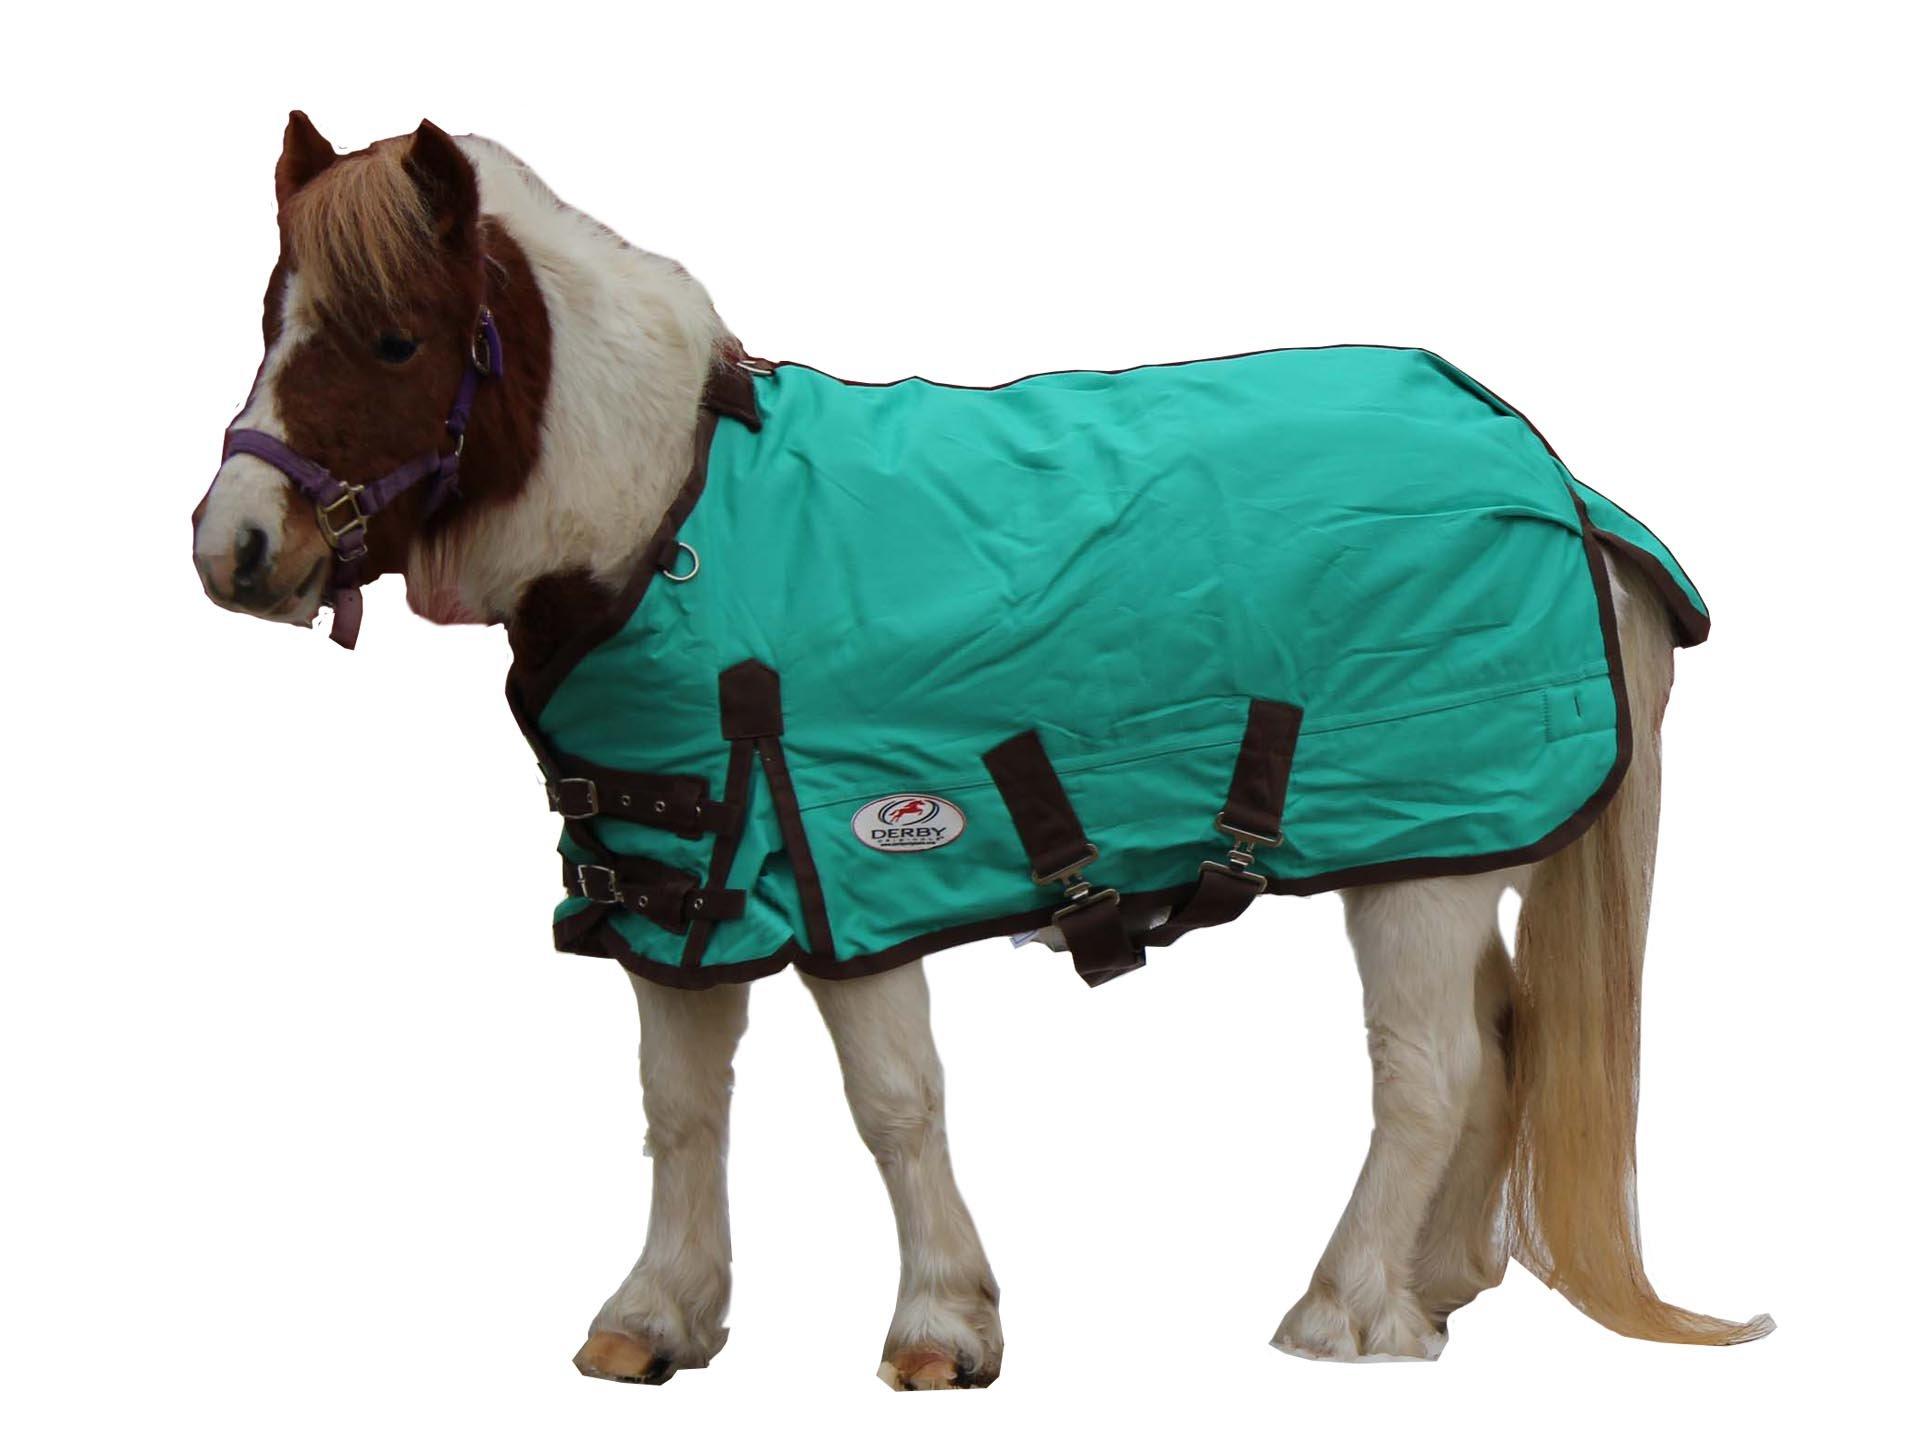 Derby Originals 1200D 300G Heavy Duty Mini Horse Winter Turnout Blanket